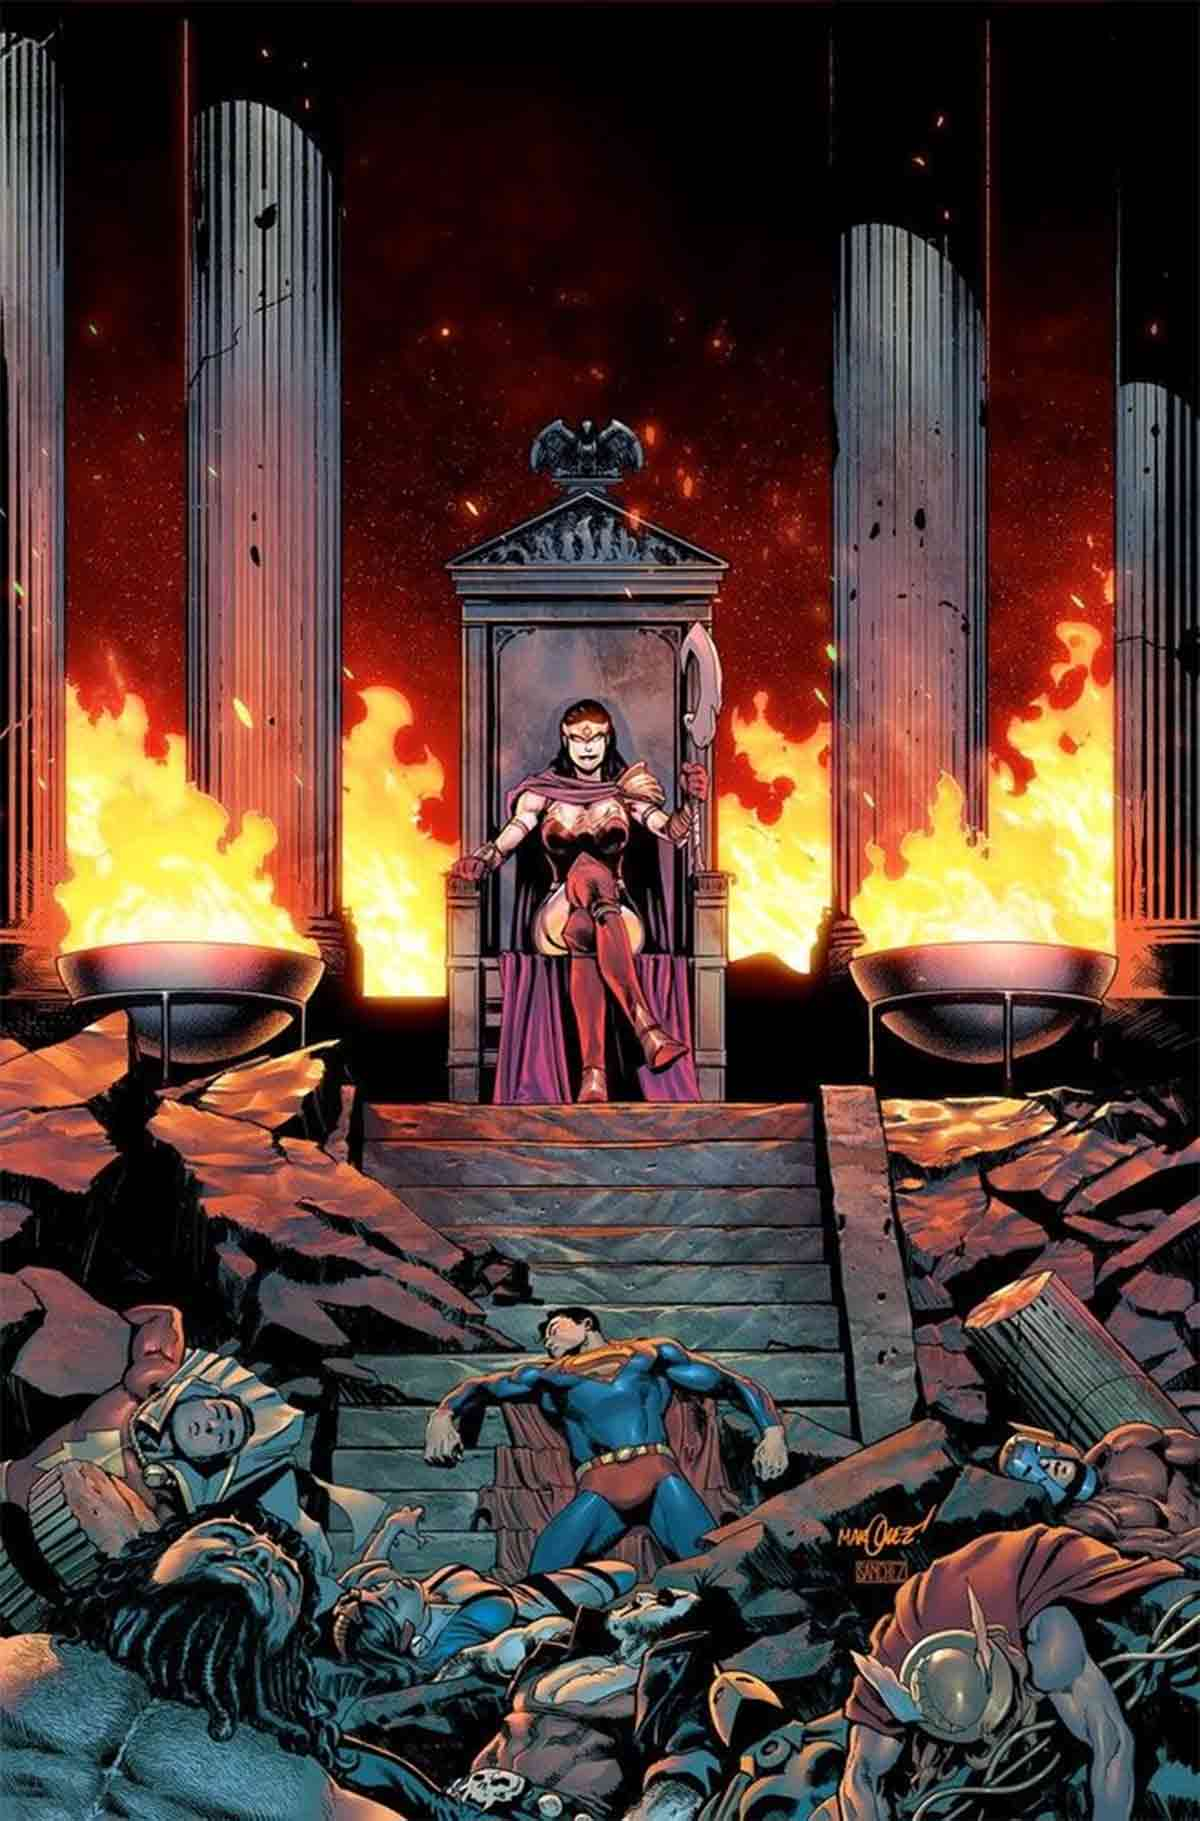 Una Wonder Woman malvada gobierna el Universo de DC Comics